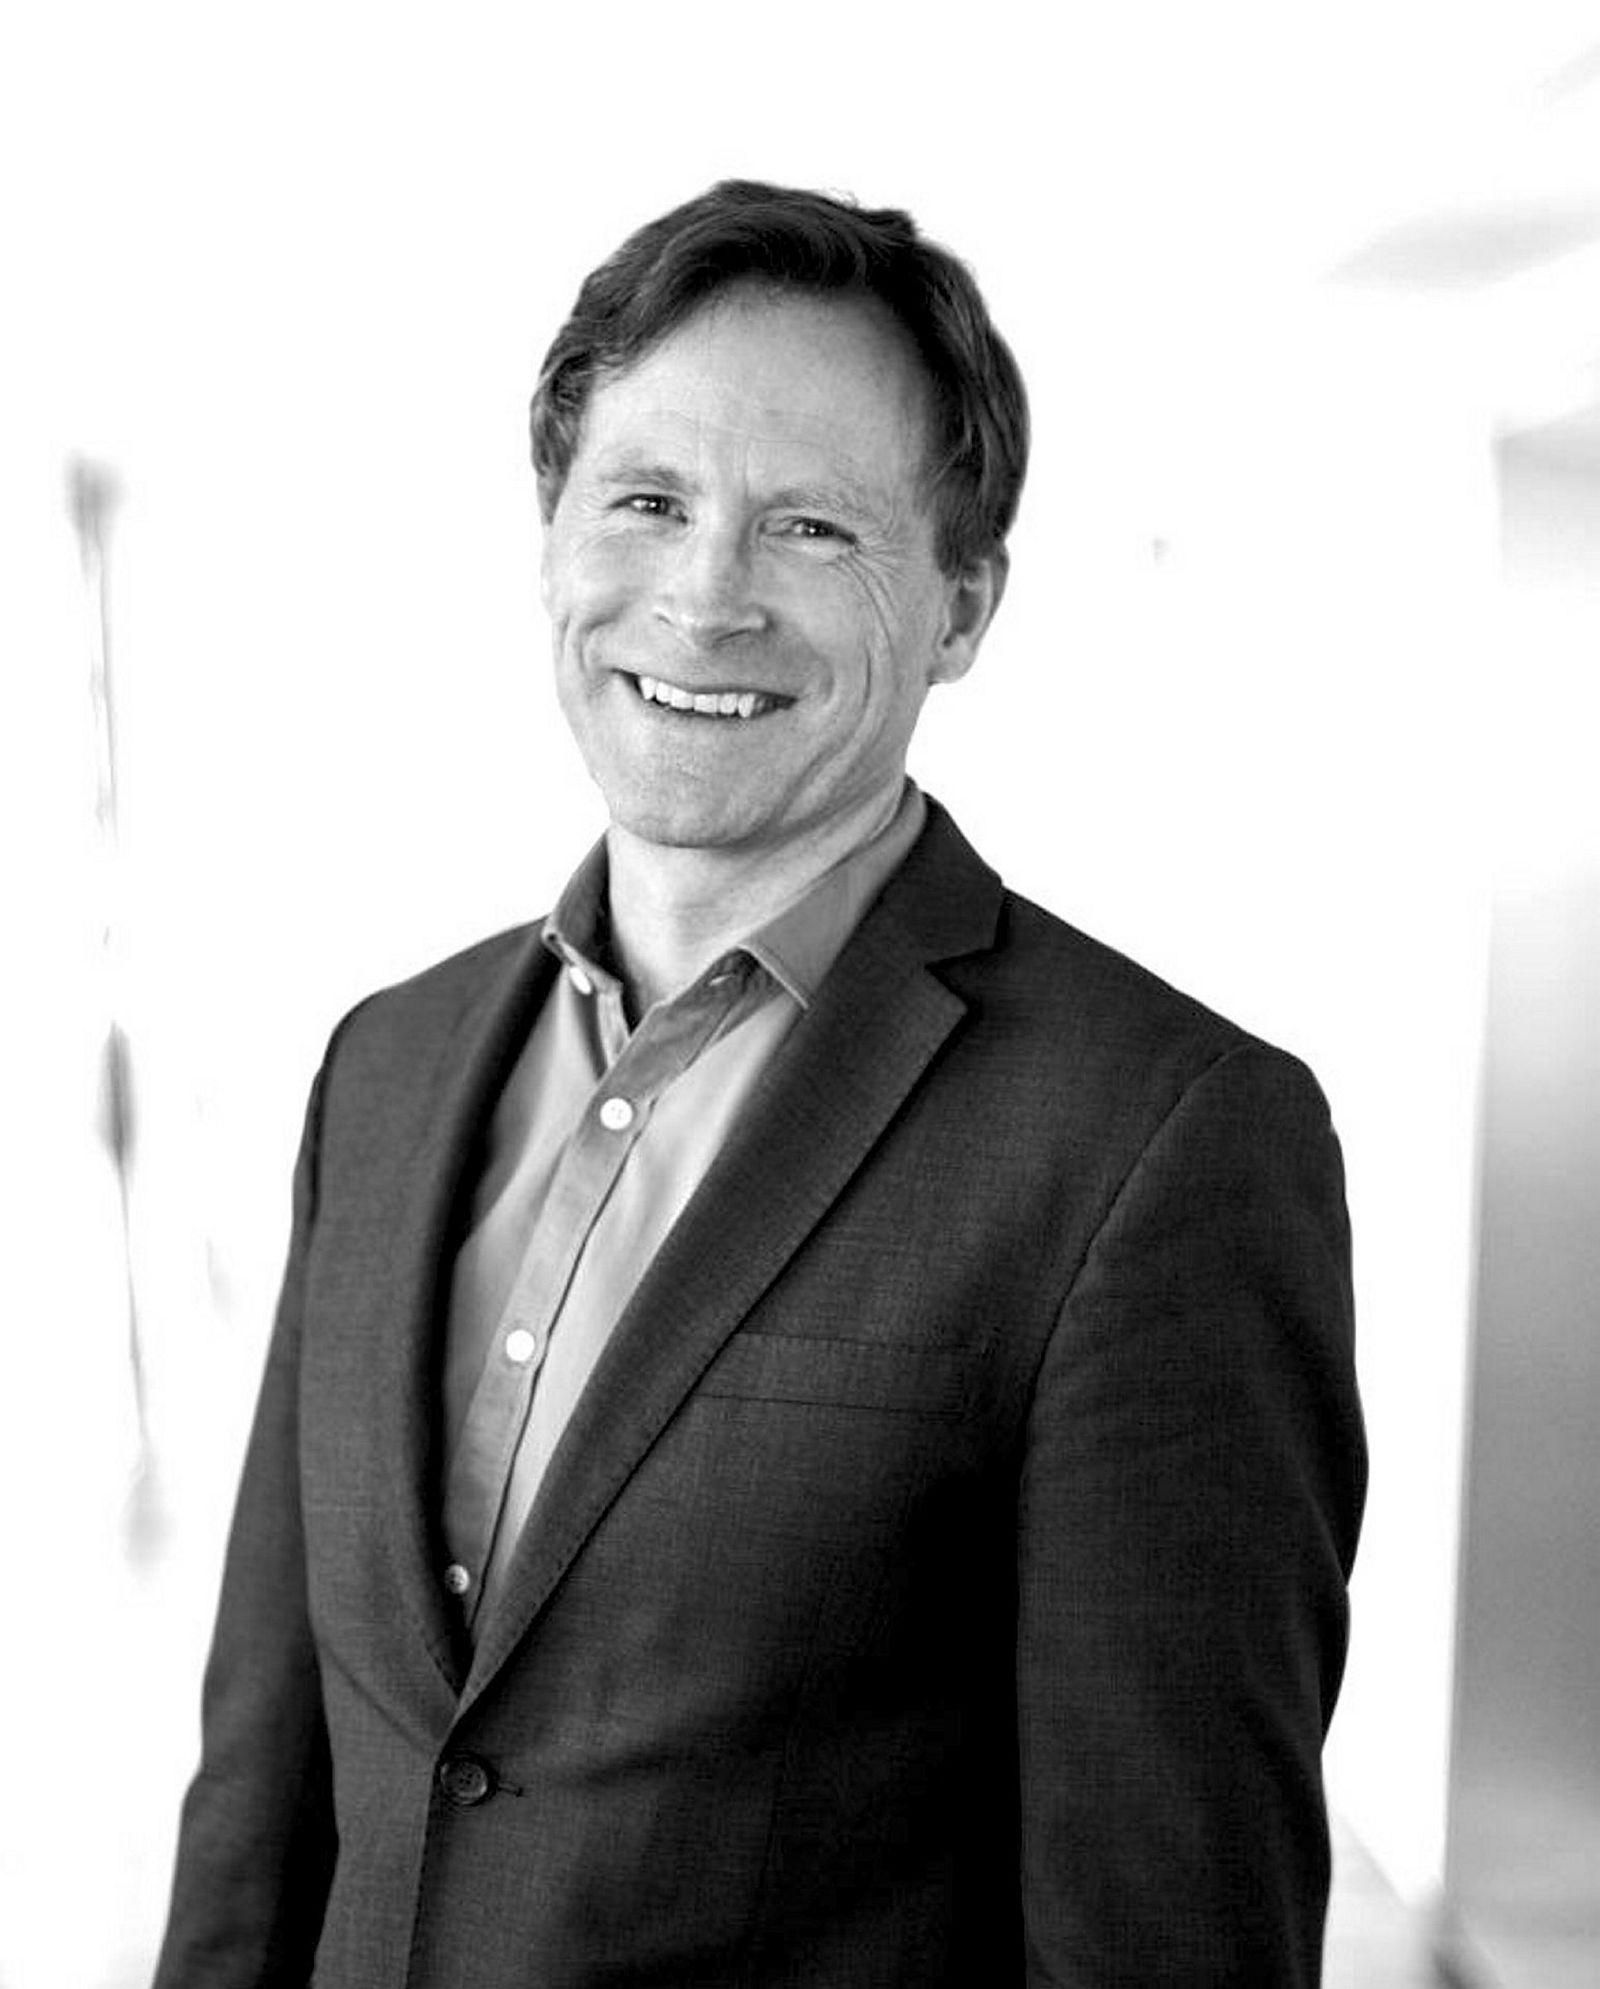 Sten Foyn, advokat, Advokatfirmaet Haavind as